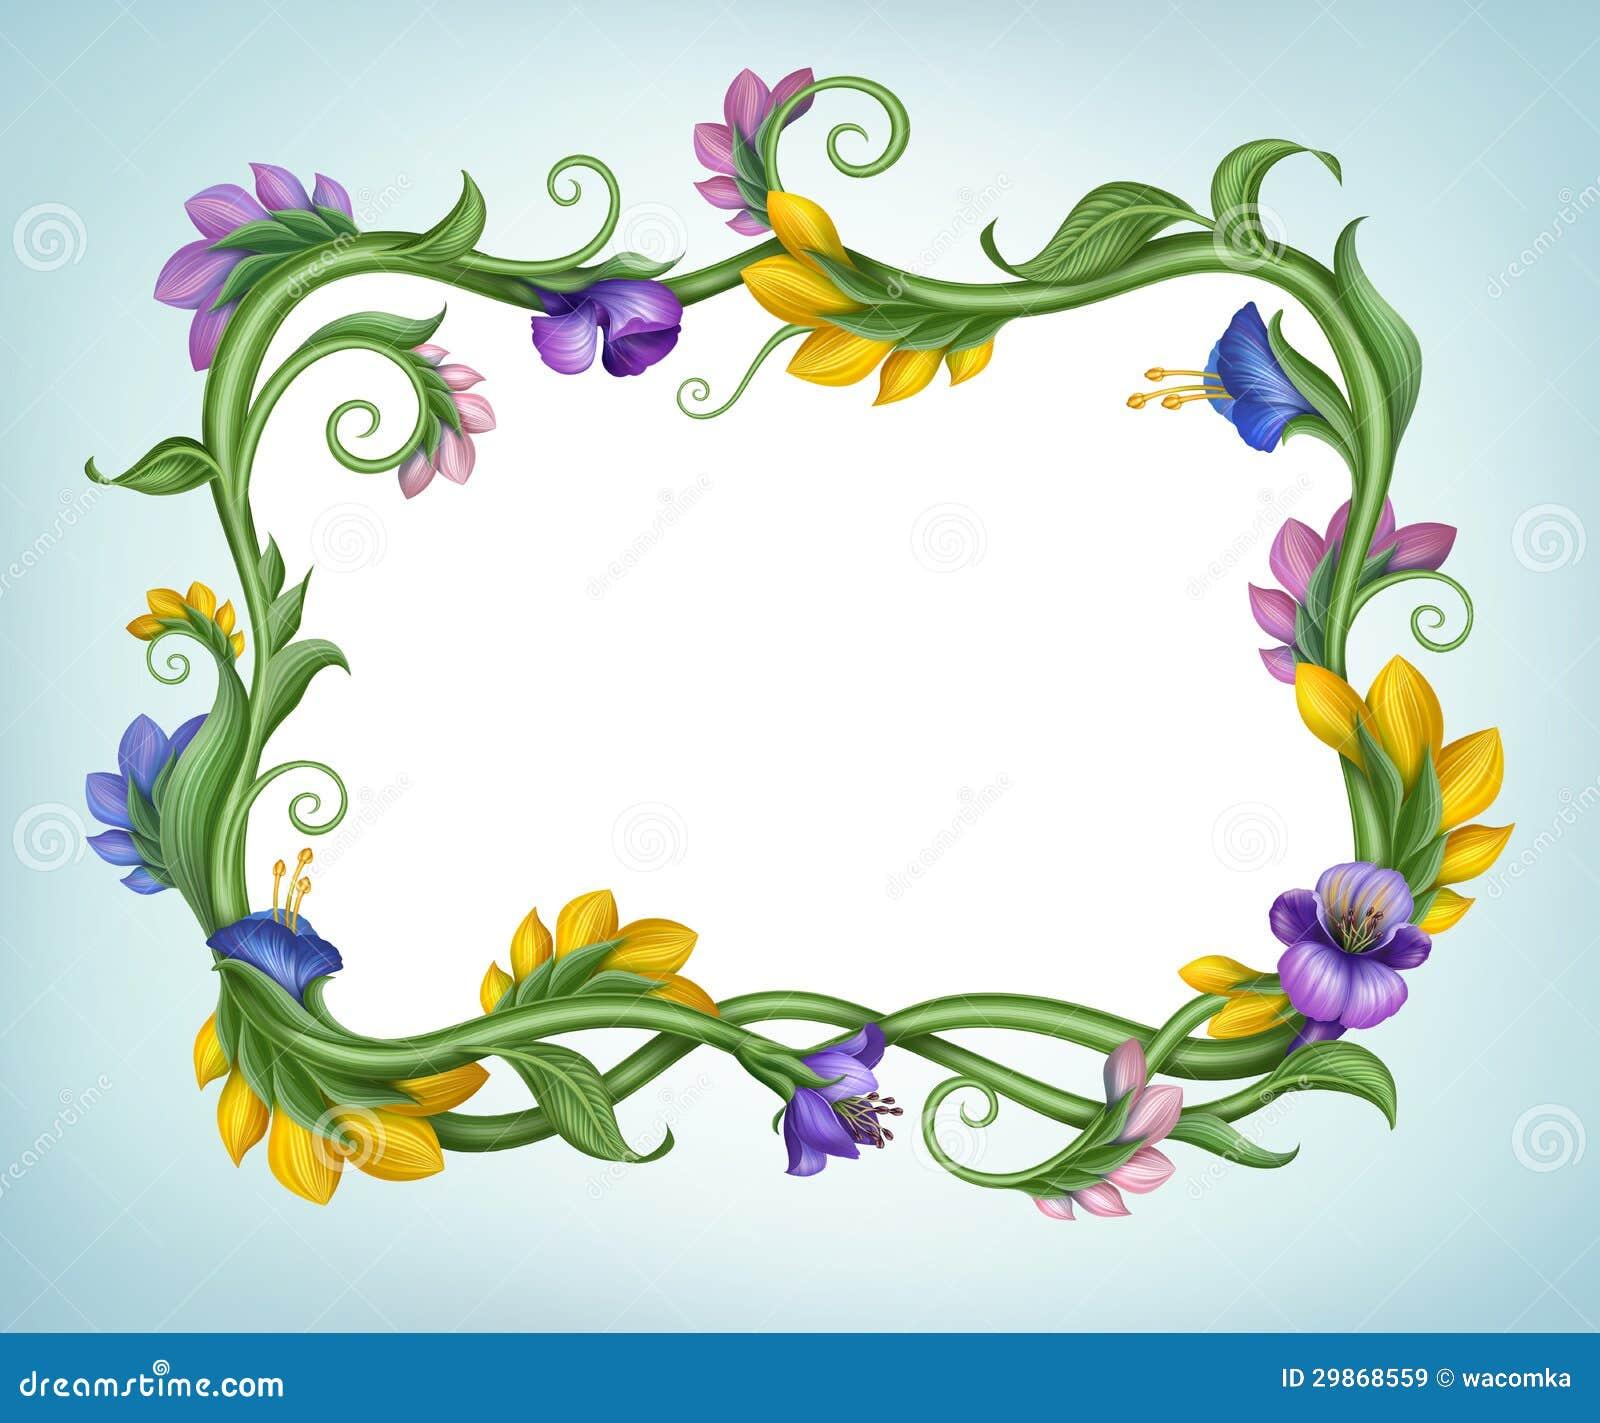 Beautiful spring flower banner frame stock illustration download beautiful spring flower banner frame stock illustration illustration of color bright 29868559 izmirmasajfo